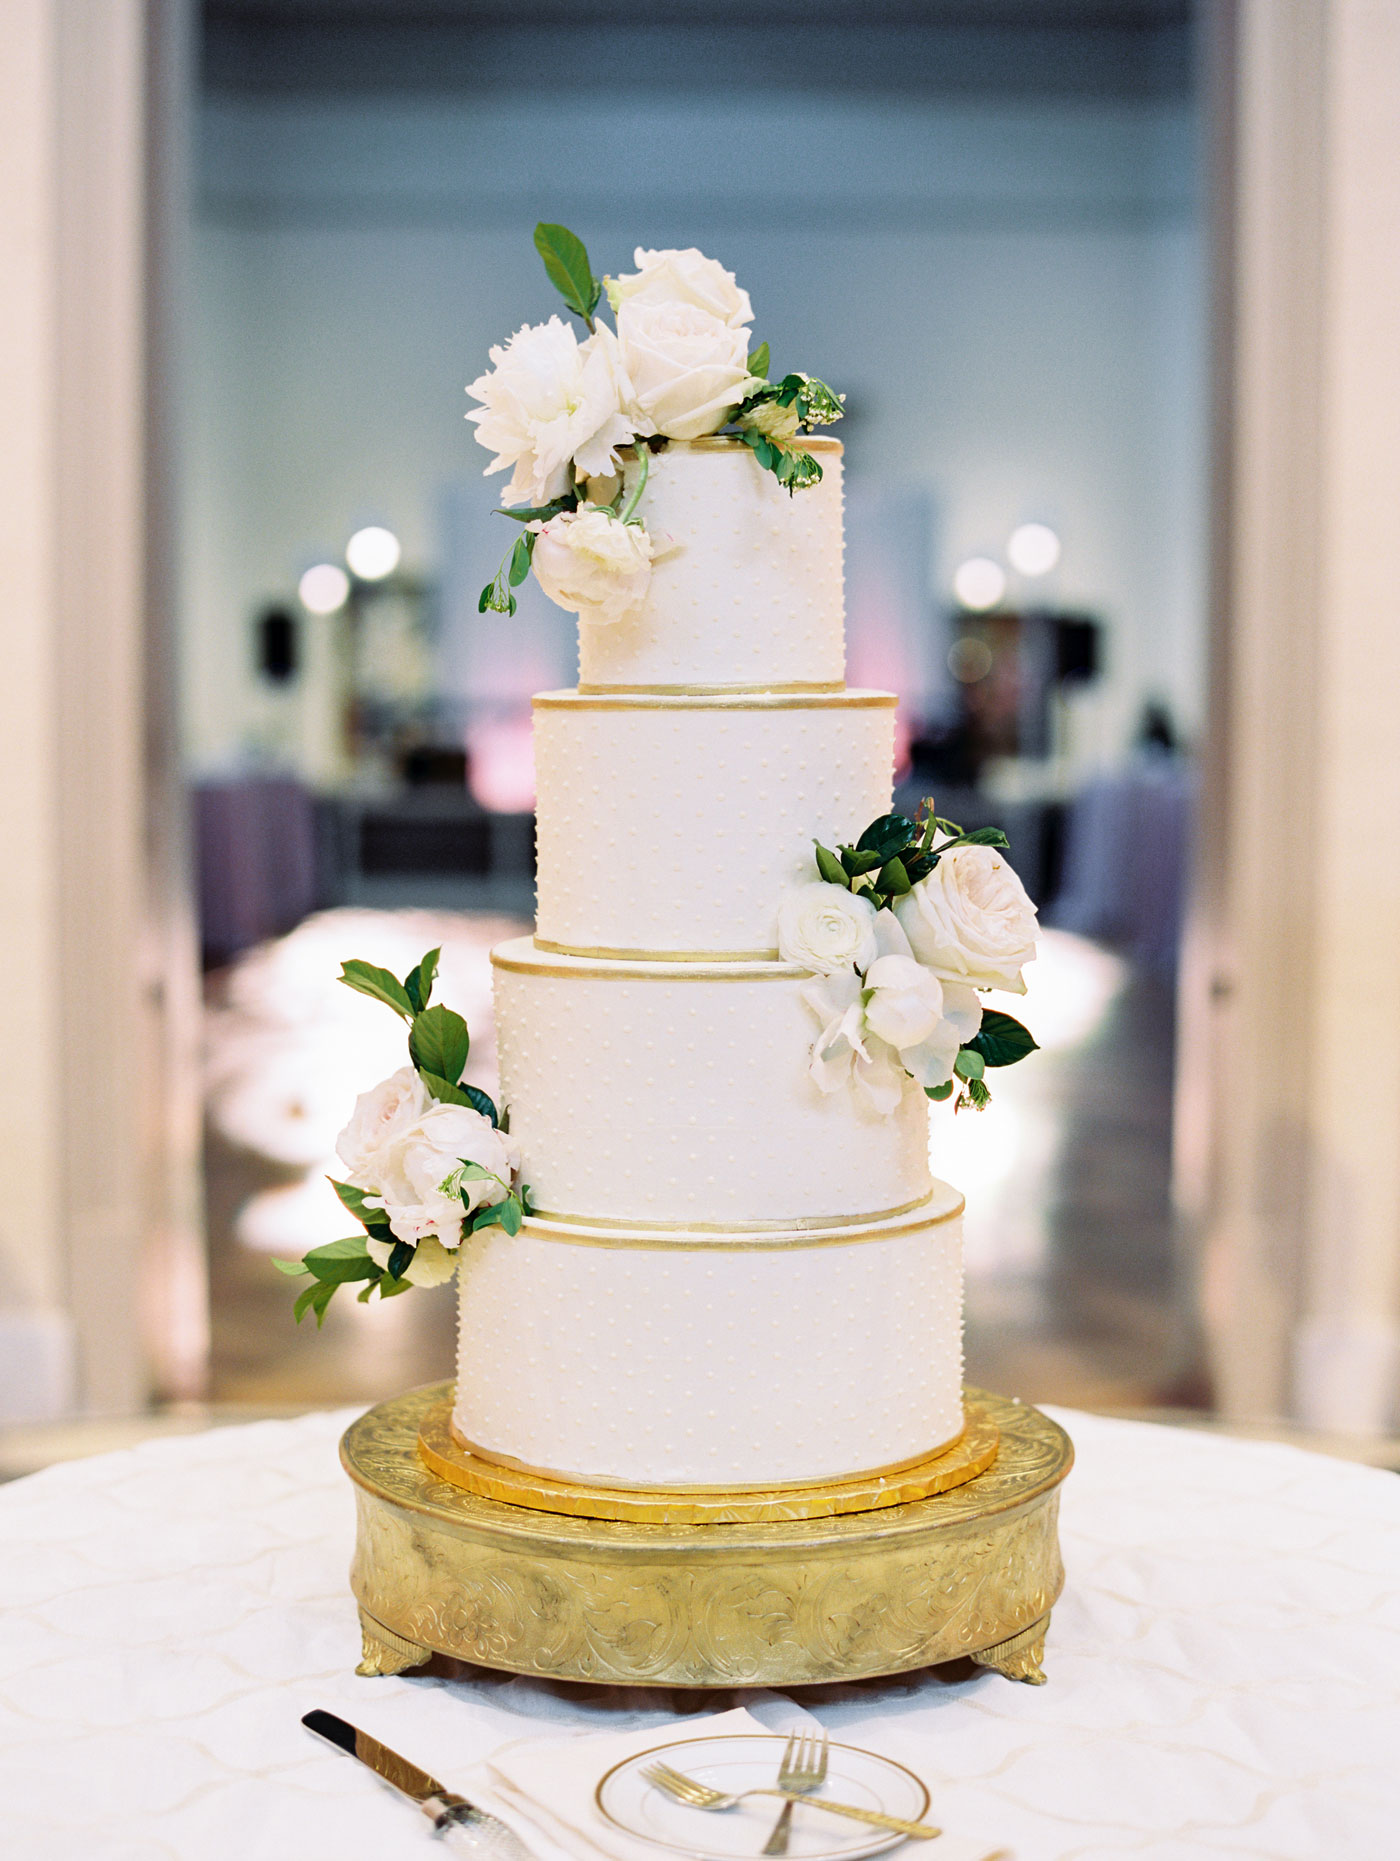 cakery bakery cake